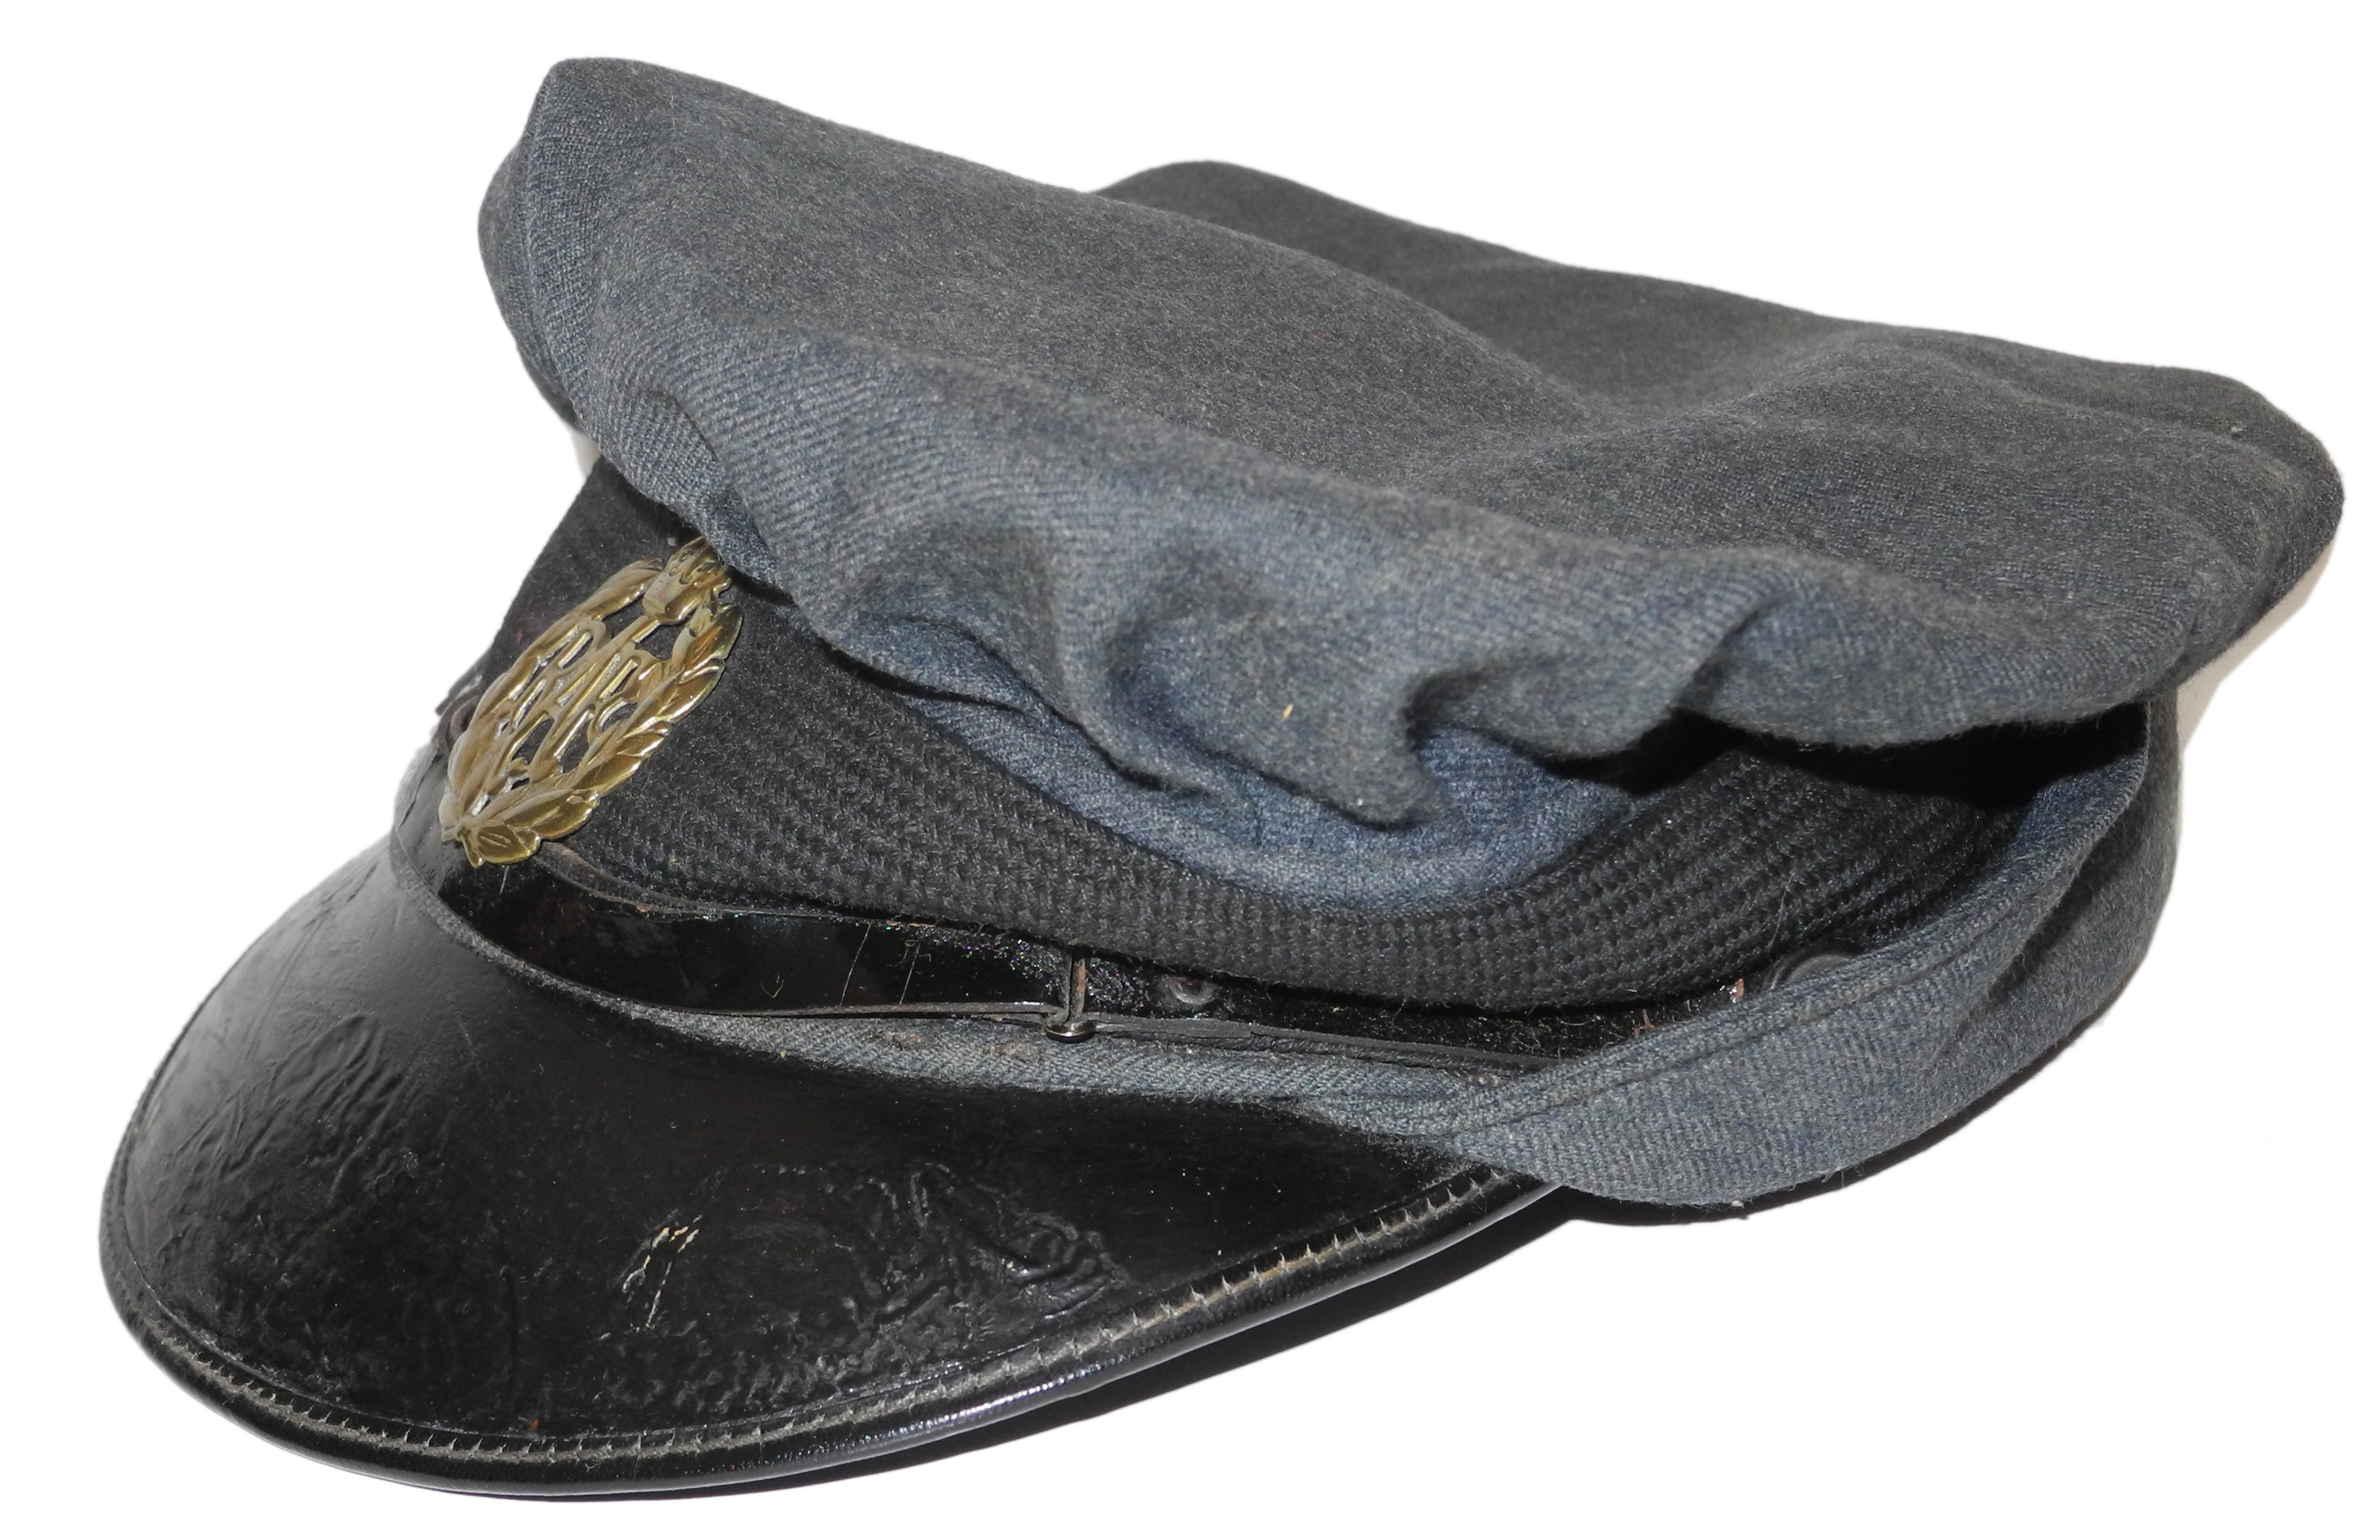 WAAF Other Ranks Service Dress Cap